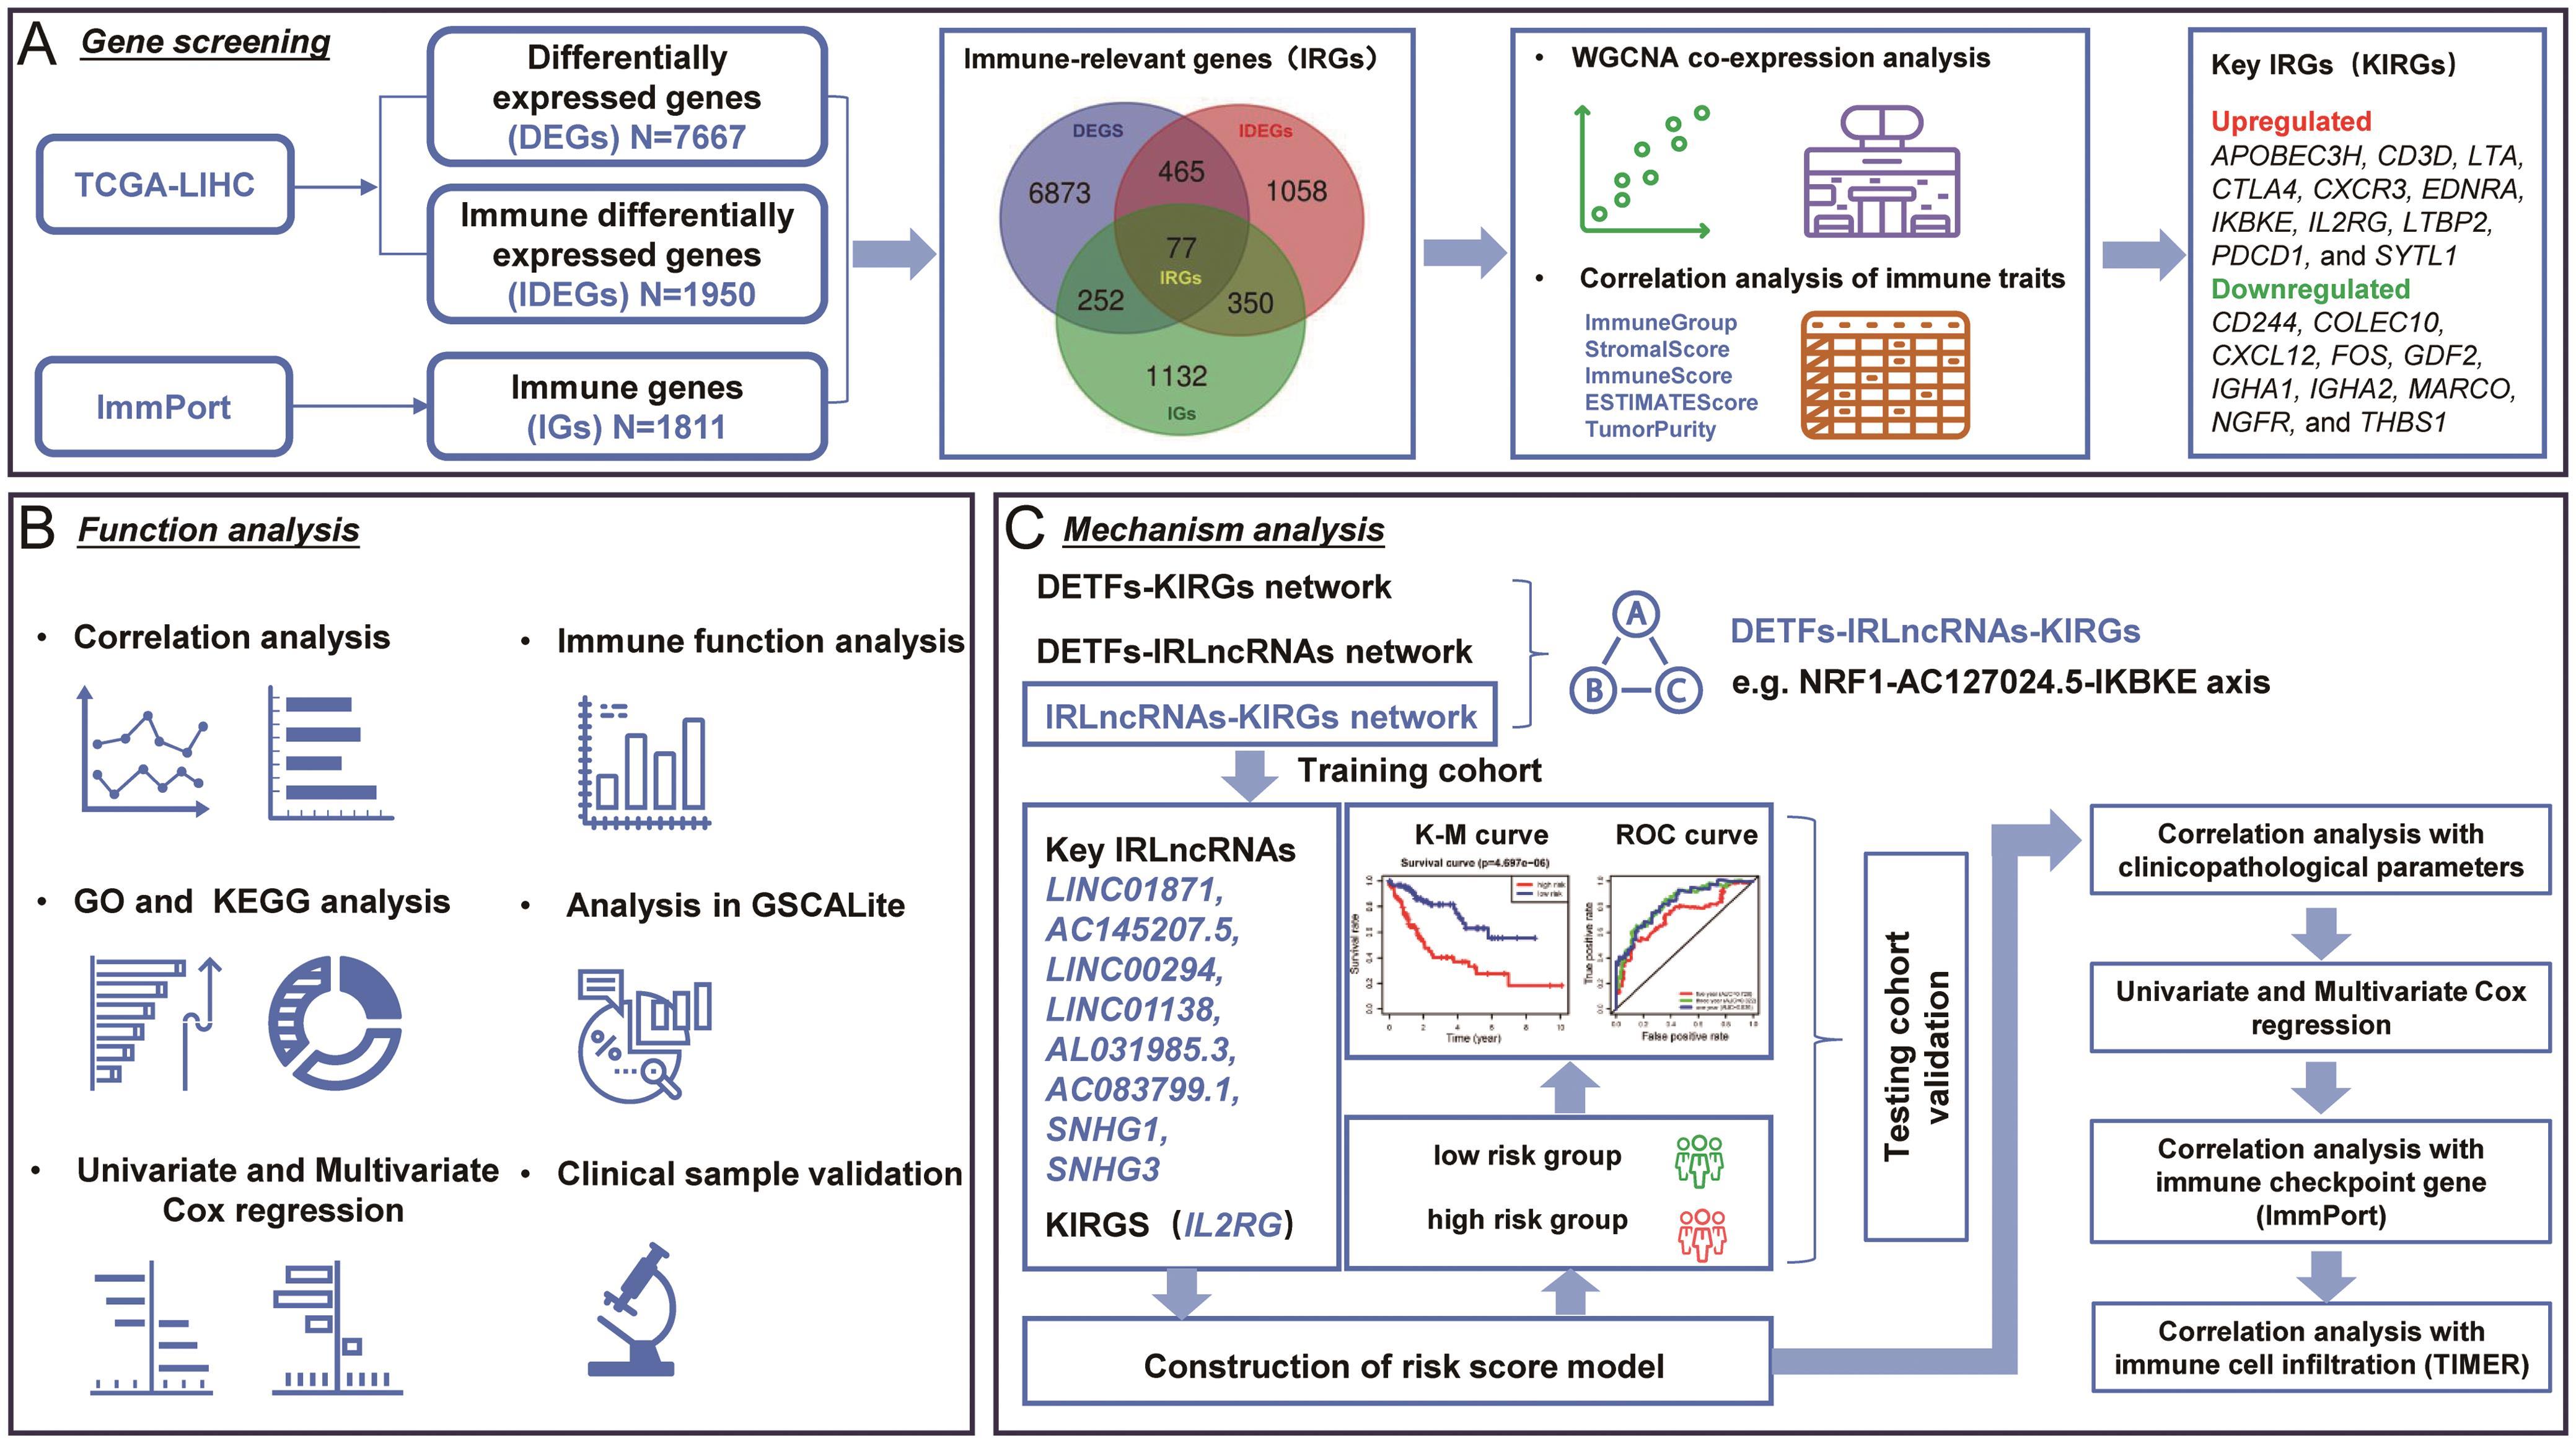 Flow chart of immune-relevant gene screening, function analysis, and mechanism analysis.